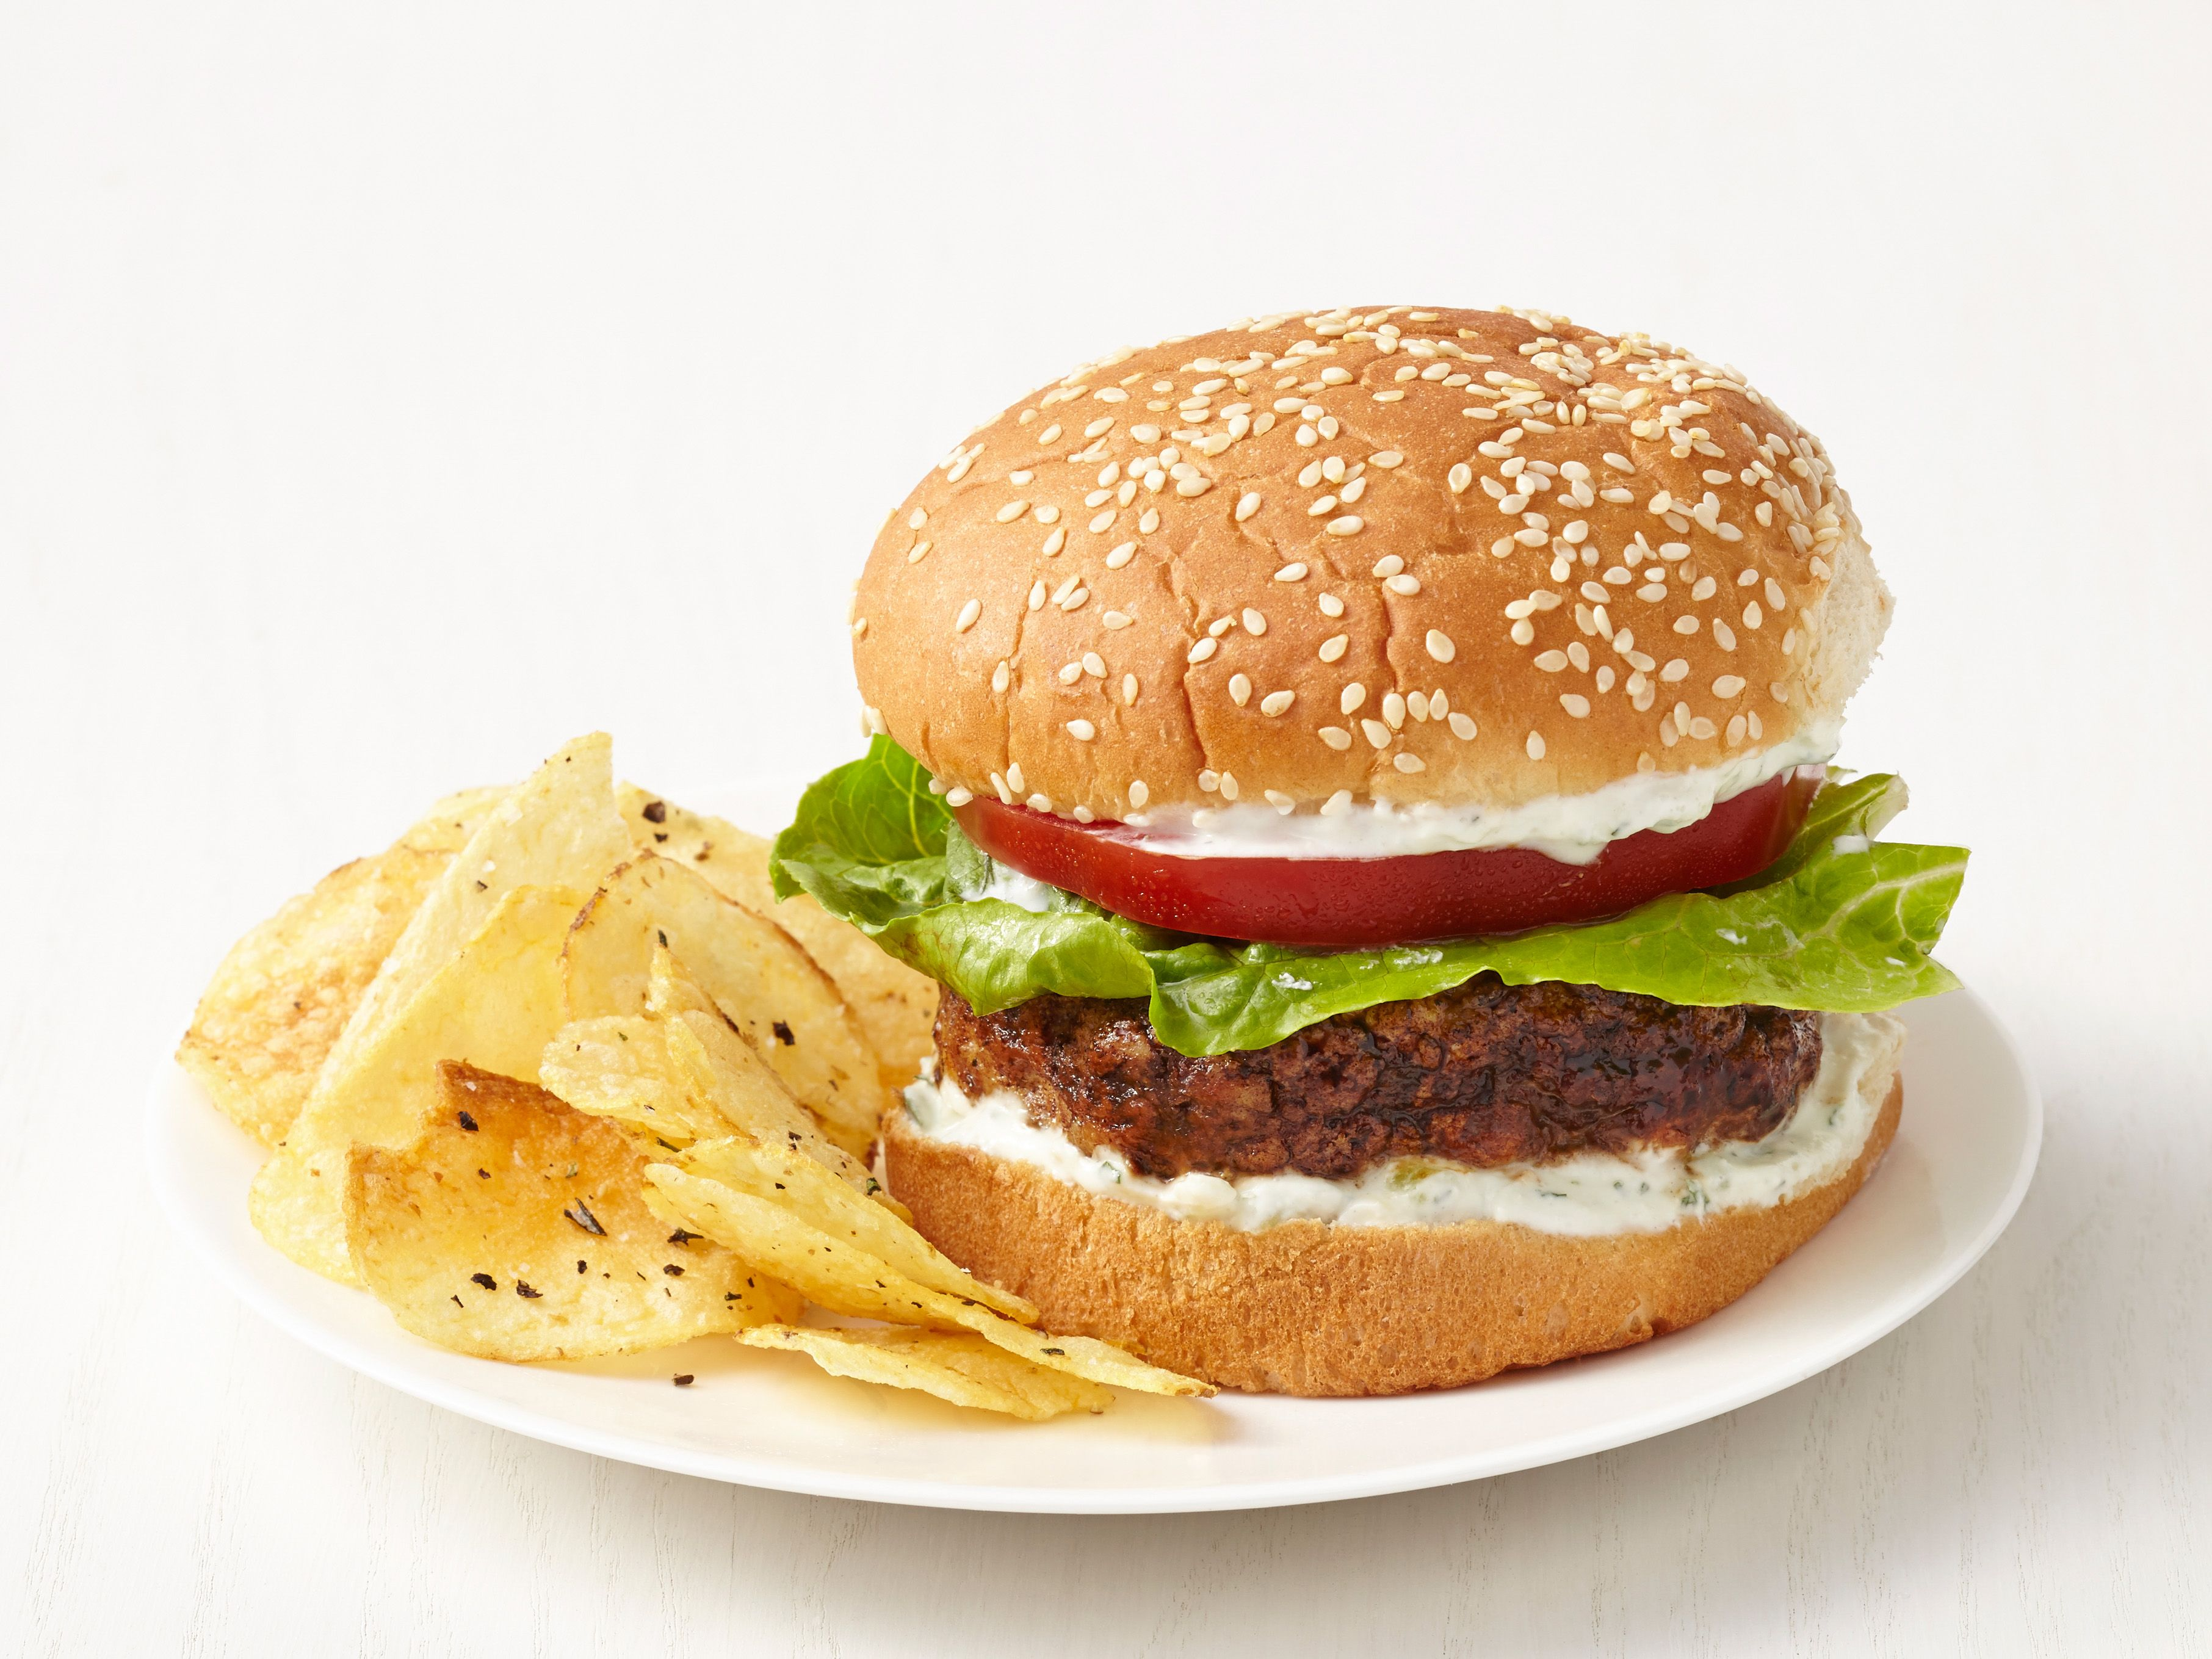 Mediterranean Turkey Burgers Recipe : Food Network Kitchen : Food Network - FoodNetwork.com